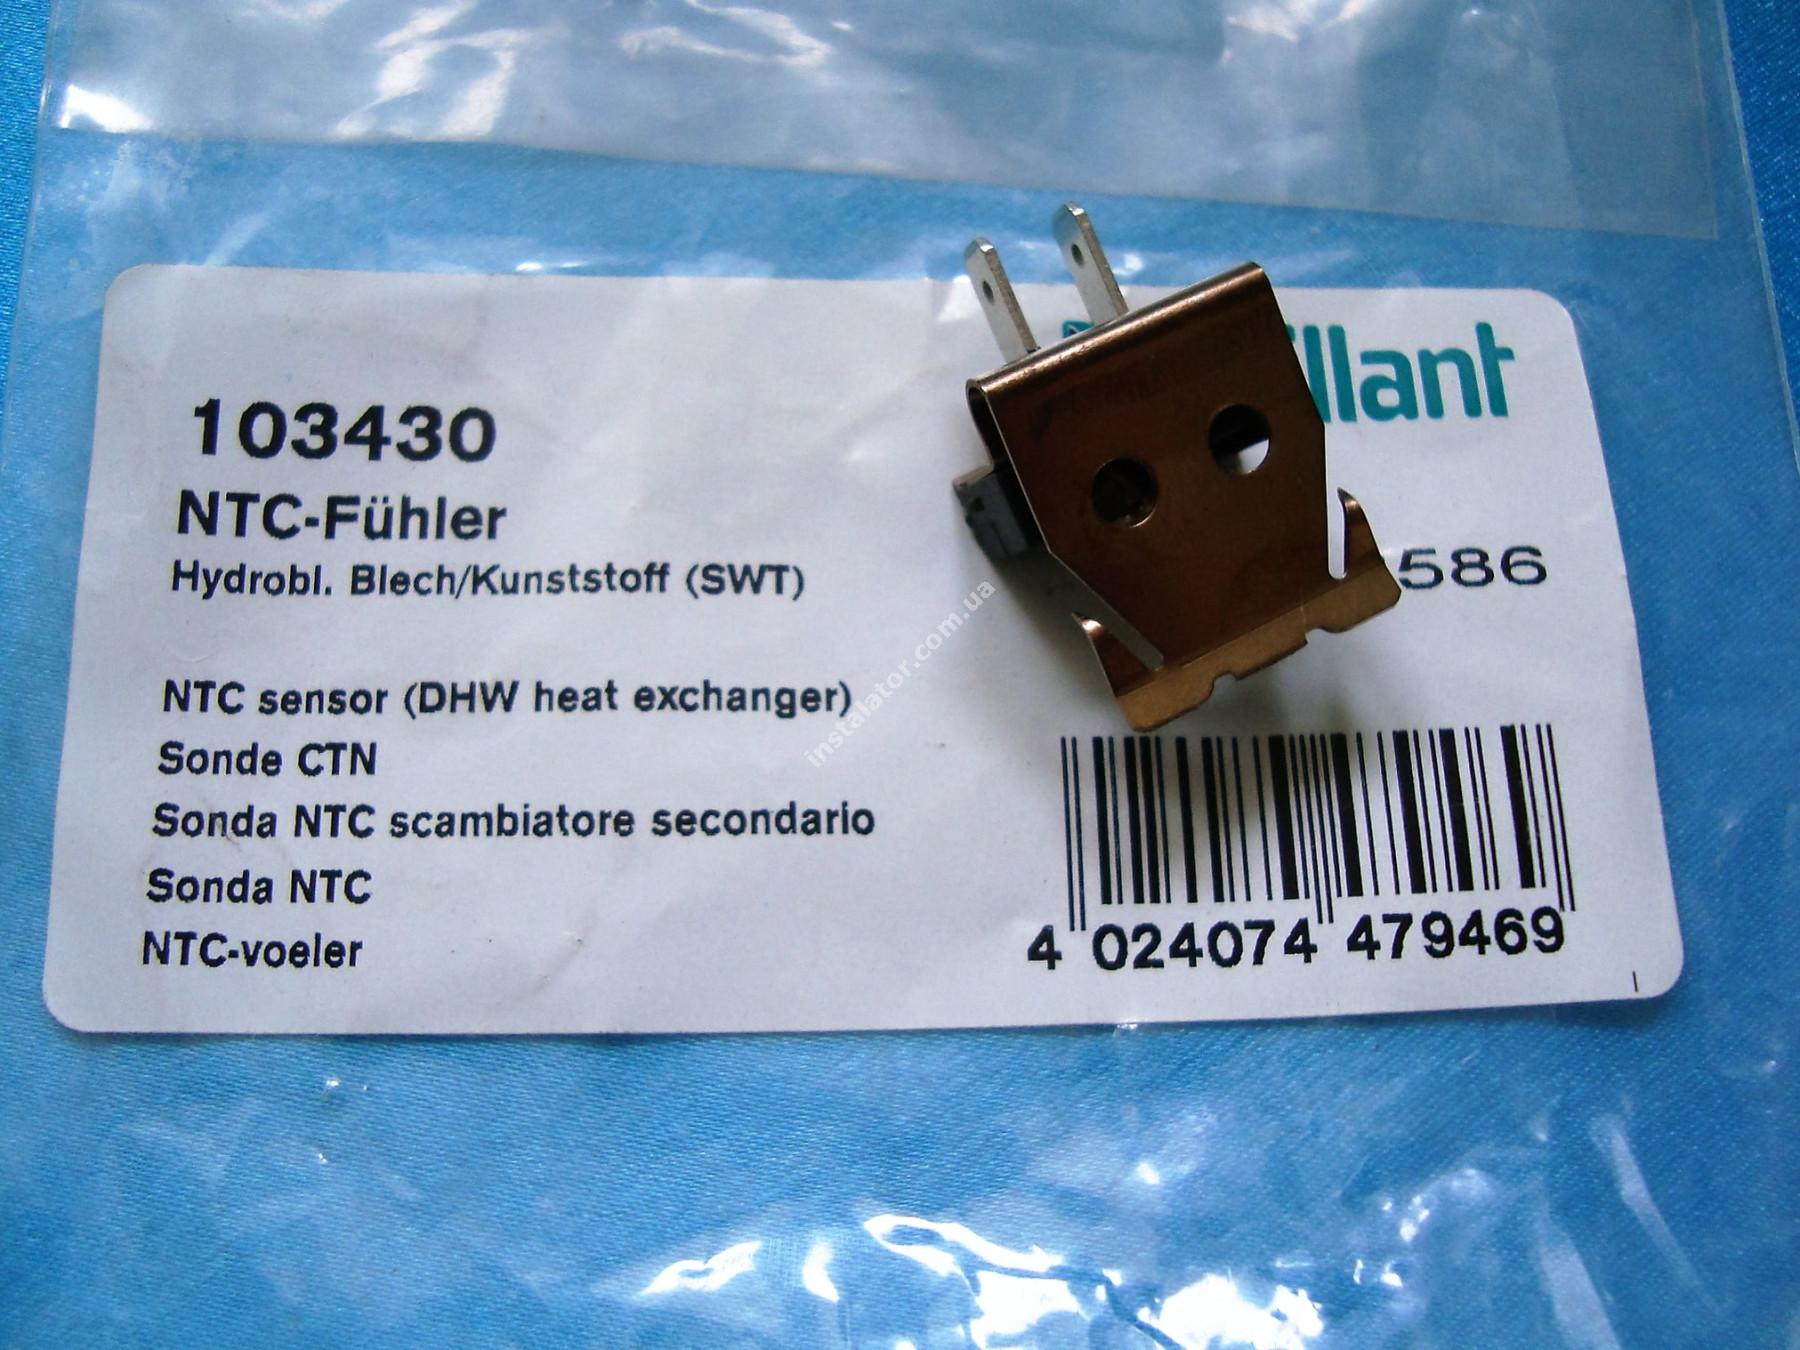 103430 Датчик температури  (зонд NTC) Vaillant turboTEC, atmoTEC, ecoTEC full-image-1